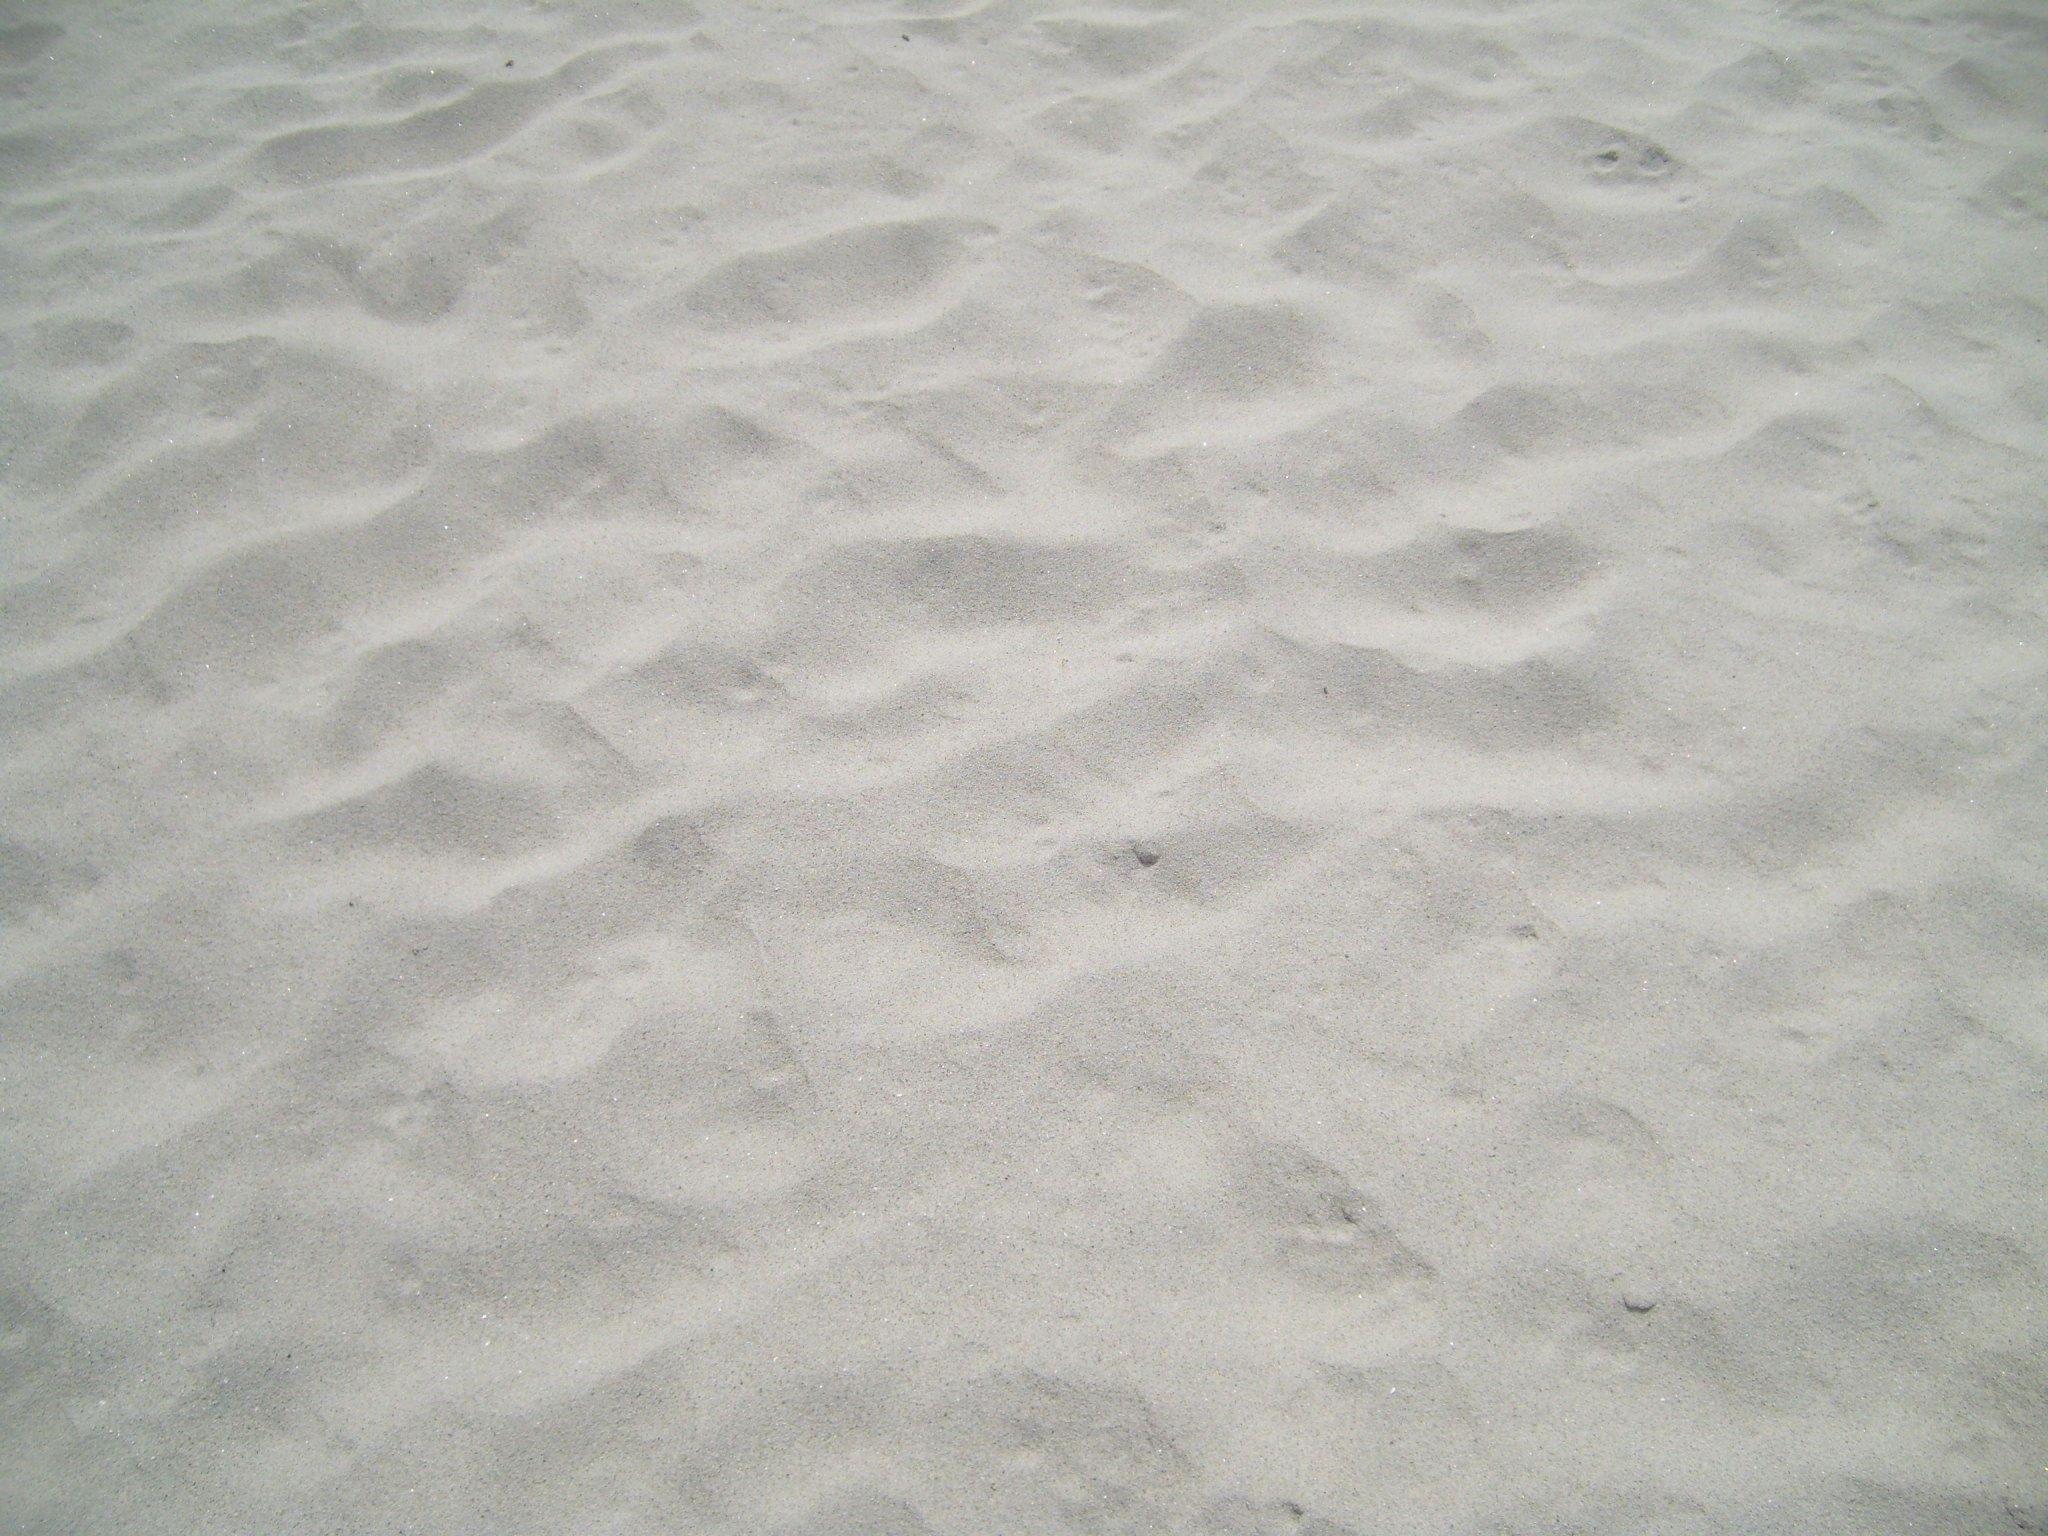 Free Landscape Wallpaper Hd Free Picture White Soft Sand Beach